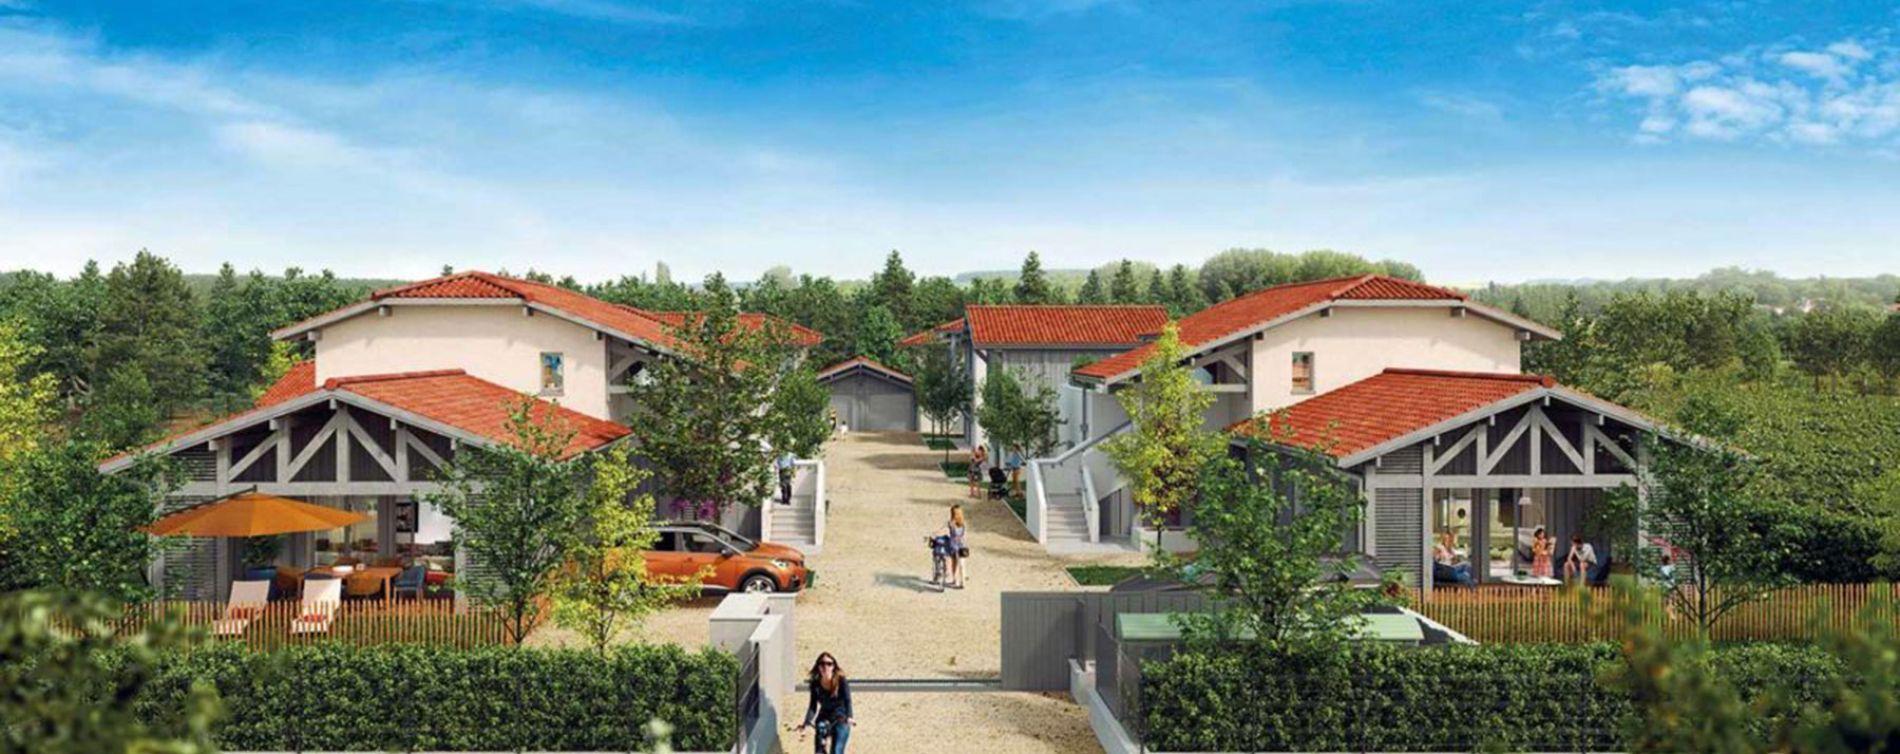 Soorts-Hossegor : programme immobilier neuve « Programme immobilier n°219043 » en Loi Pinel (2)